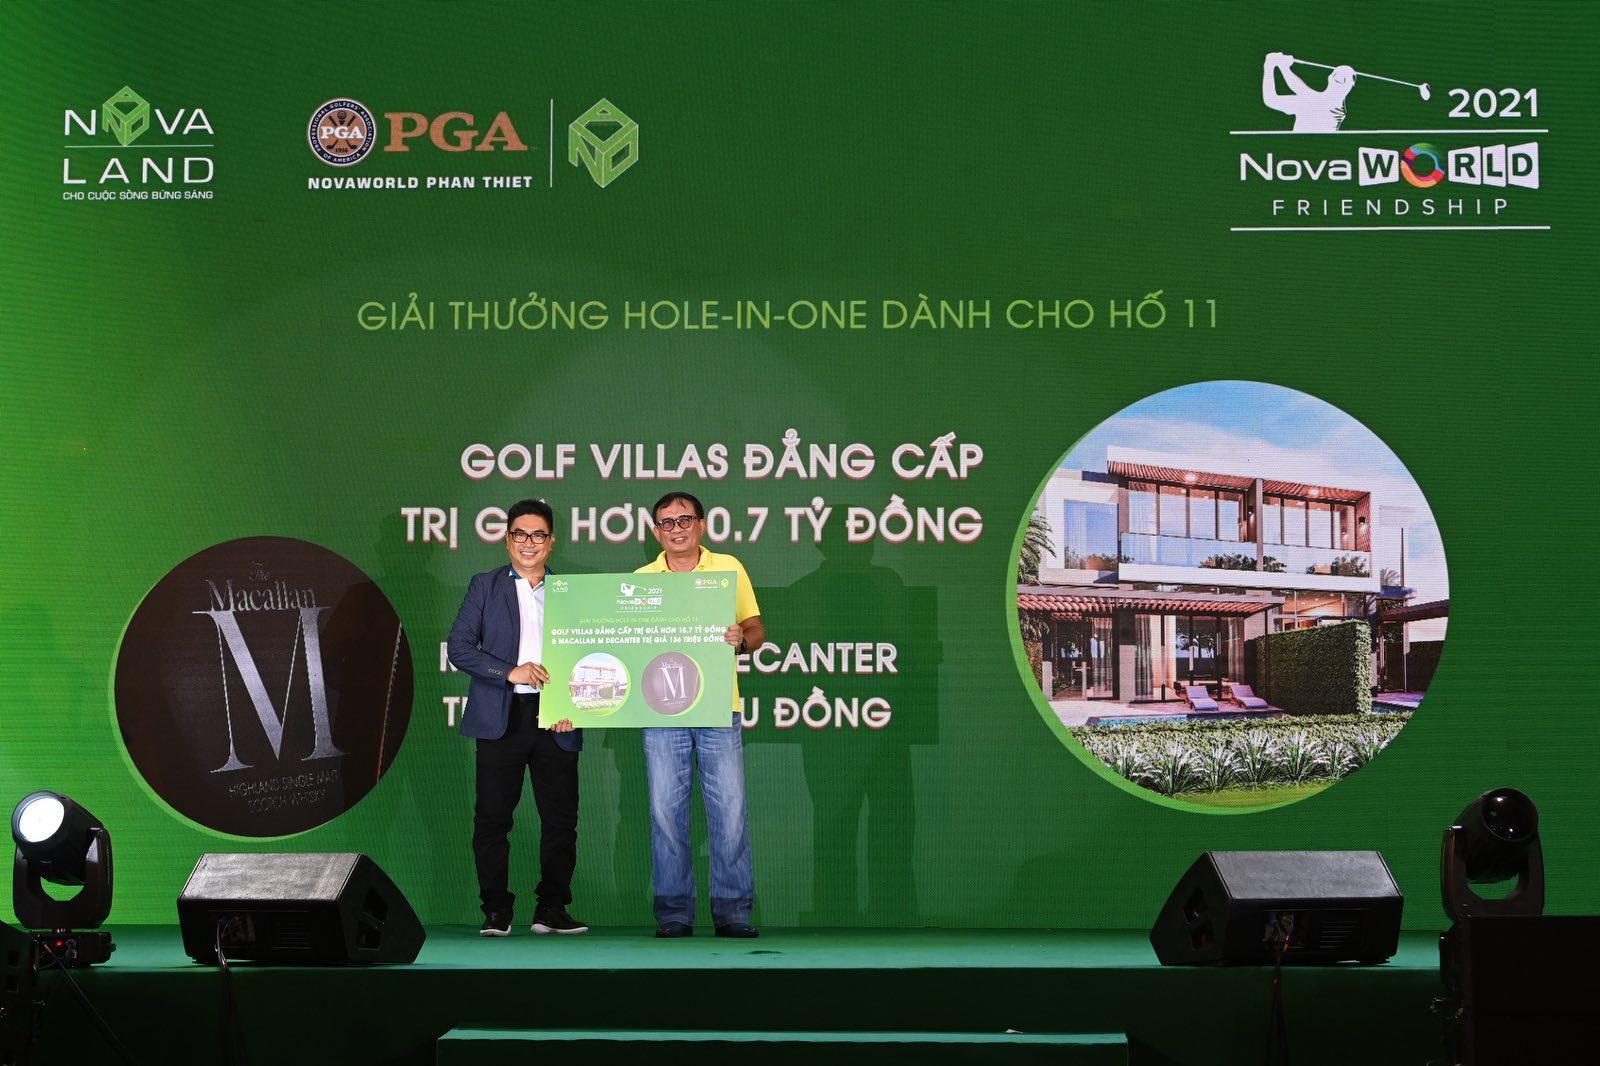 Novaland's representative gave the prize to the winner.